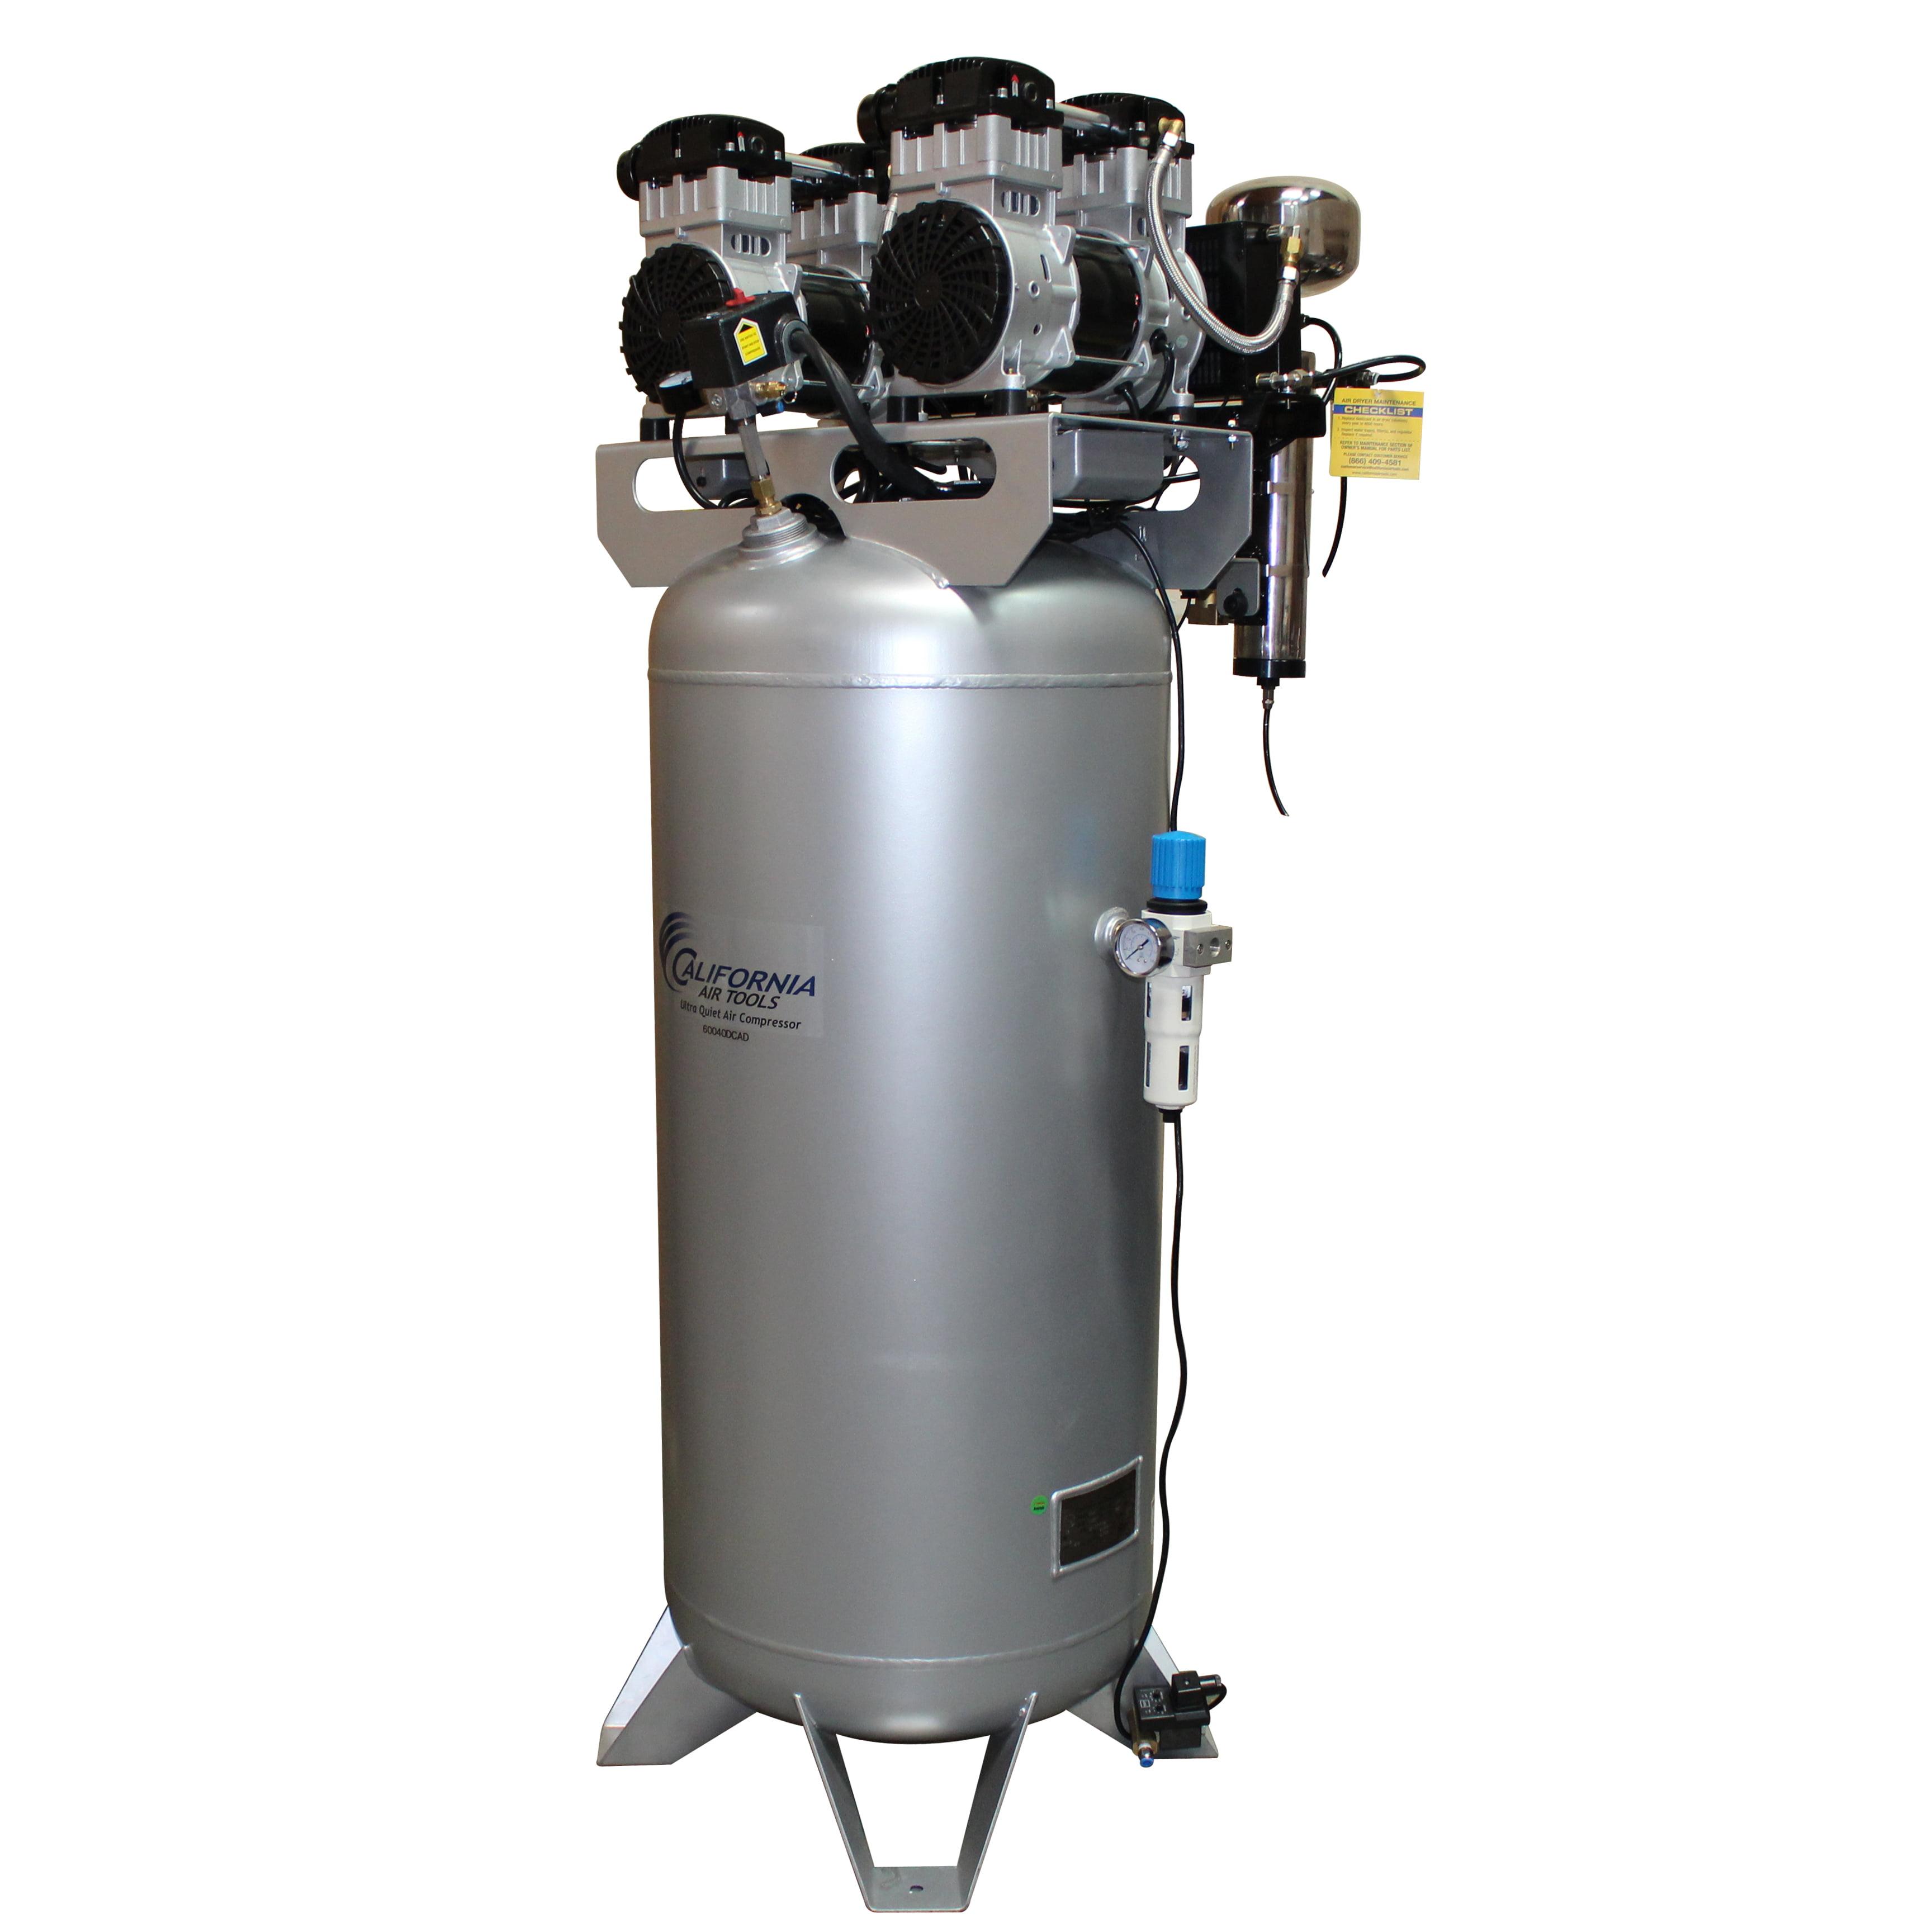 California Air Tools 60040DCAD Ultra Quiet & Oil-Free 4.0 Hp, 60.0 Gal. Steel Tank Air Compressor with Air... by California Air Tools